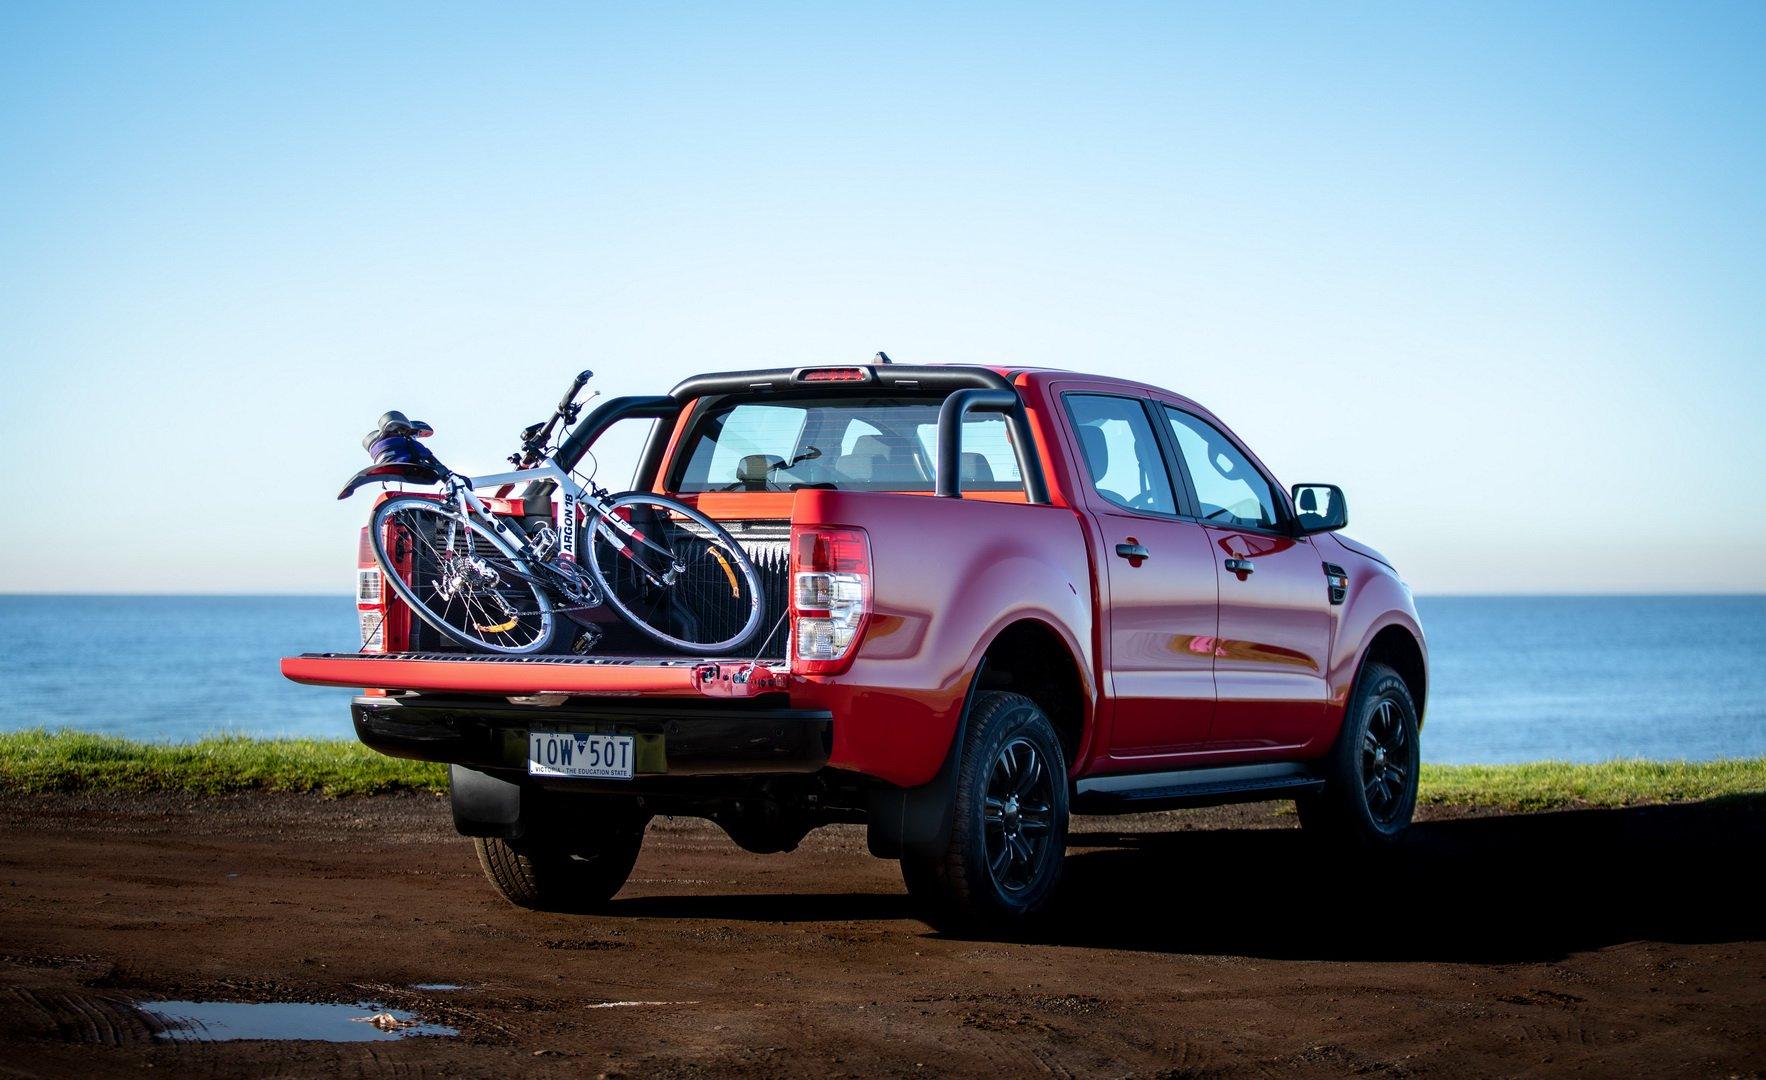 2019-ford-ranger-sport-special-edition-australia-2.jpg